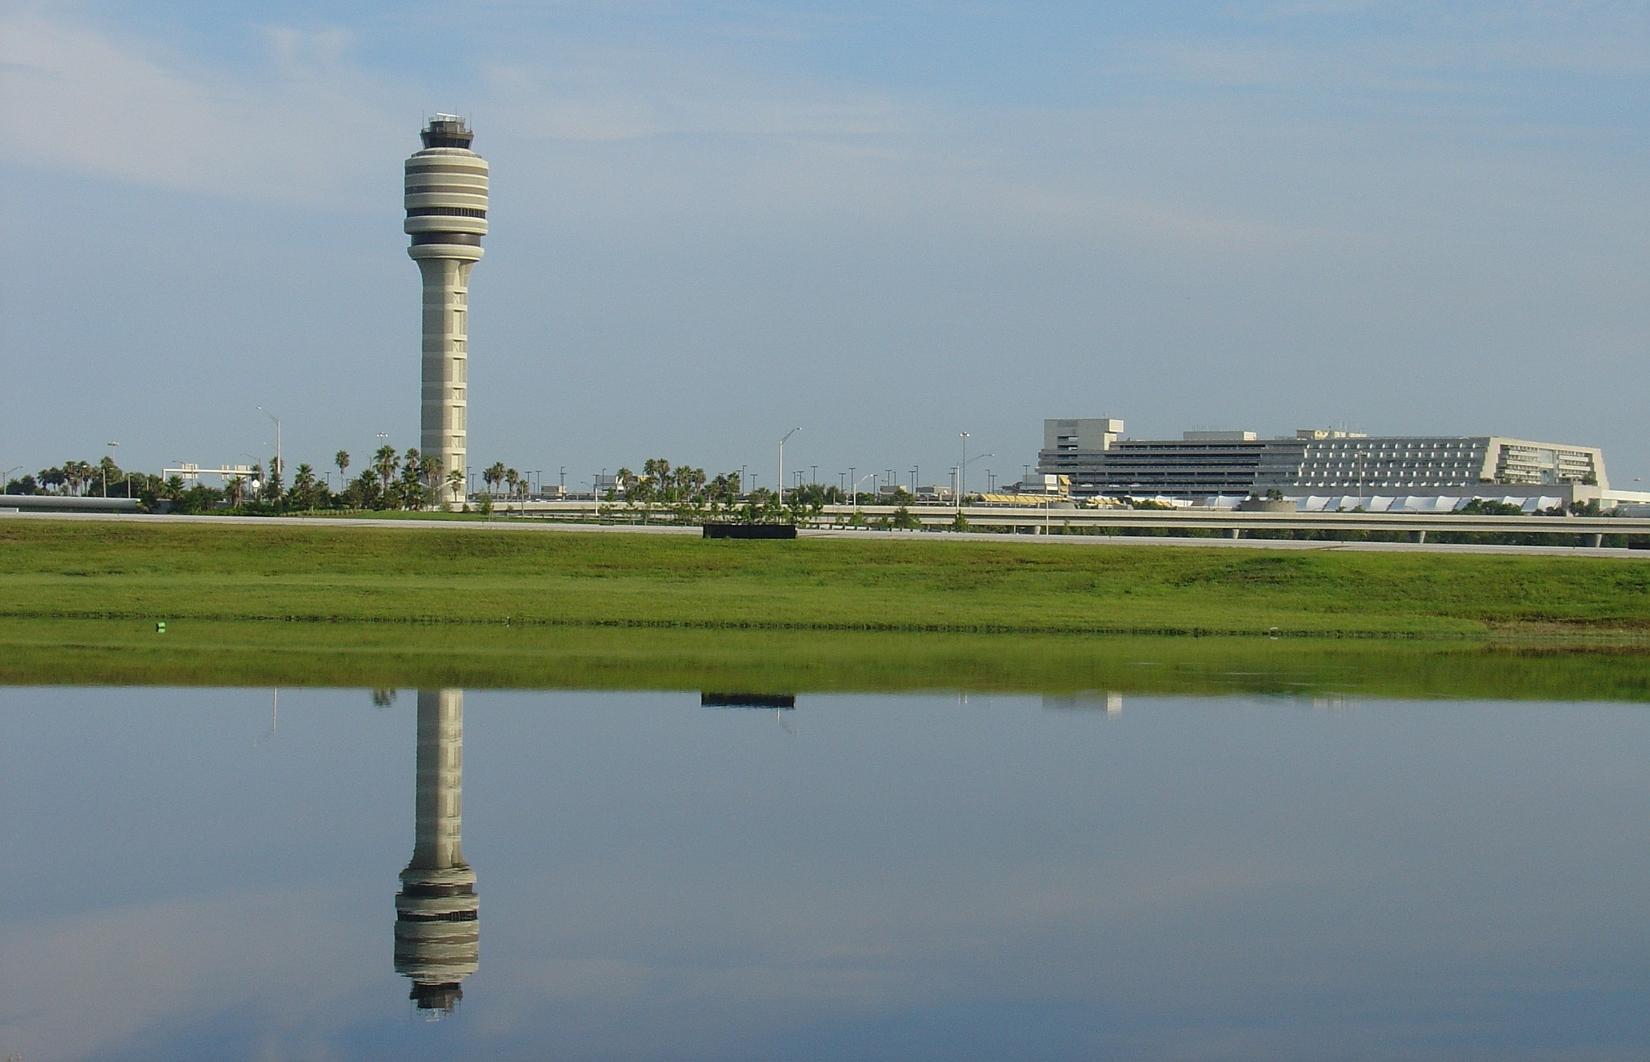 FAA Tower/Terminal Across Lake